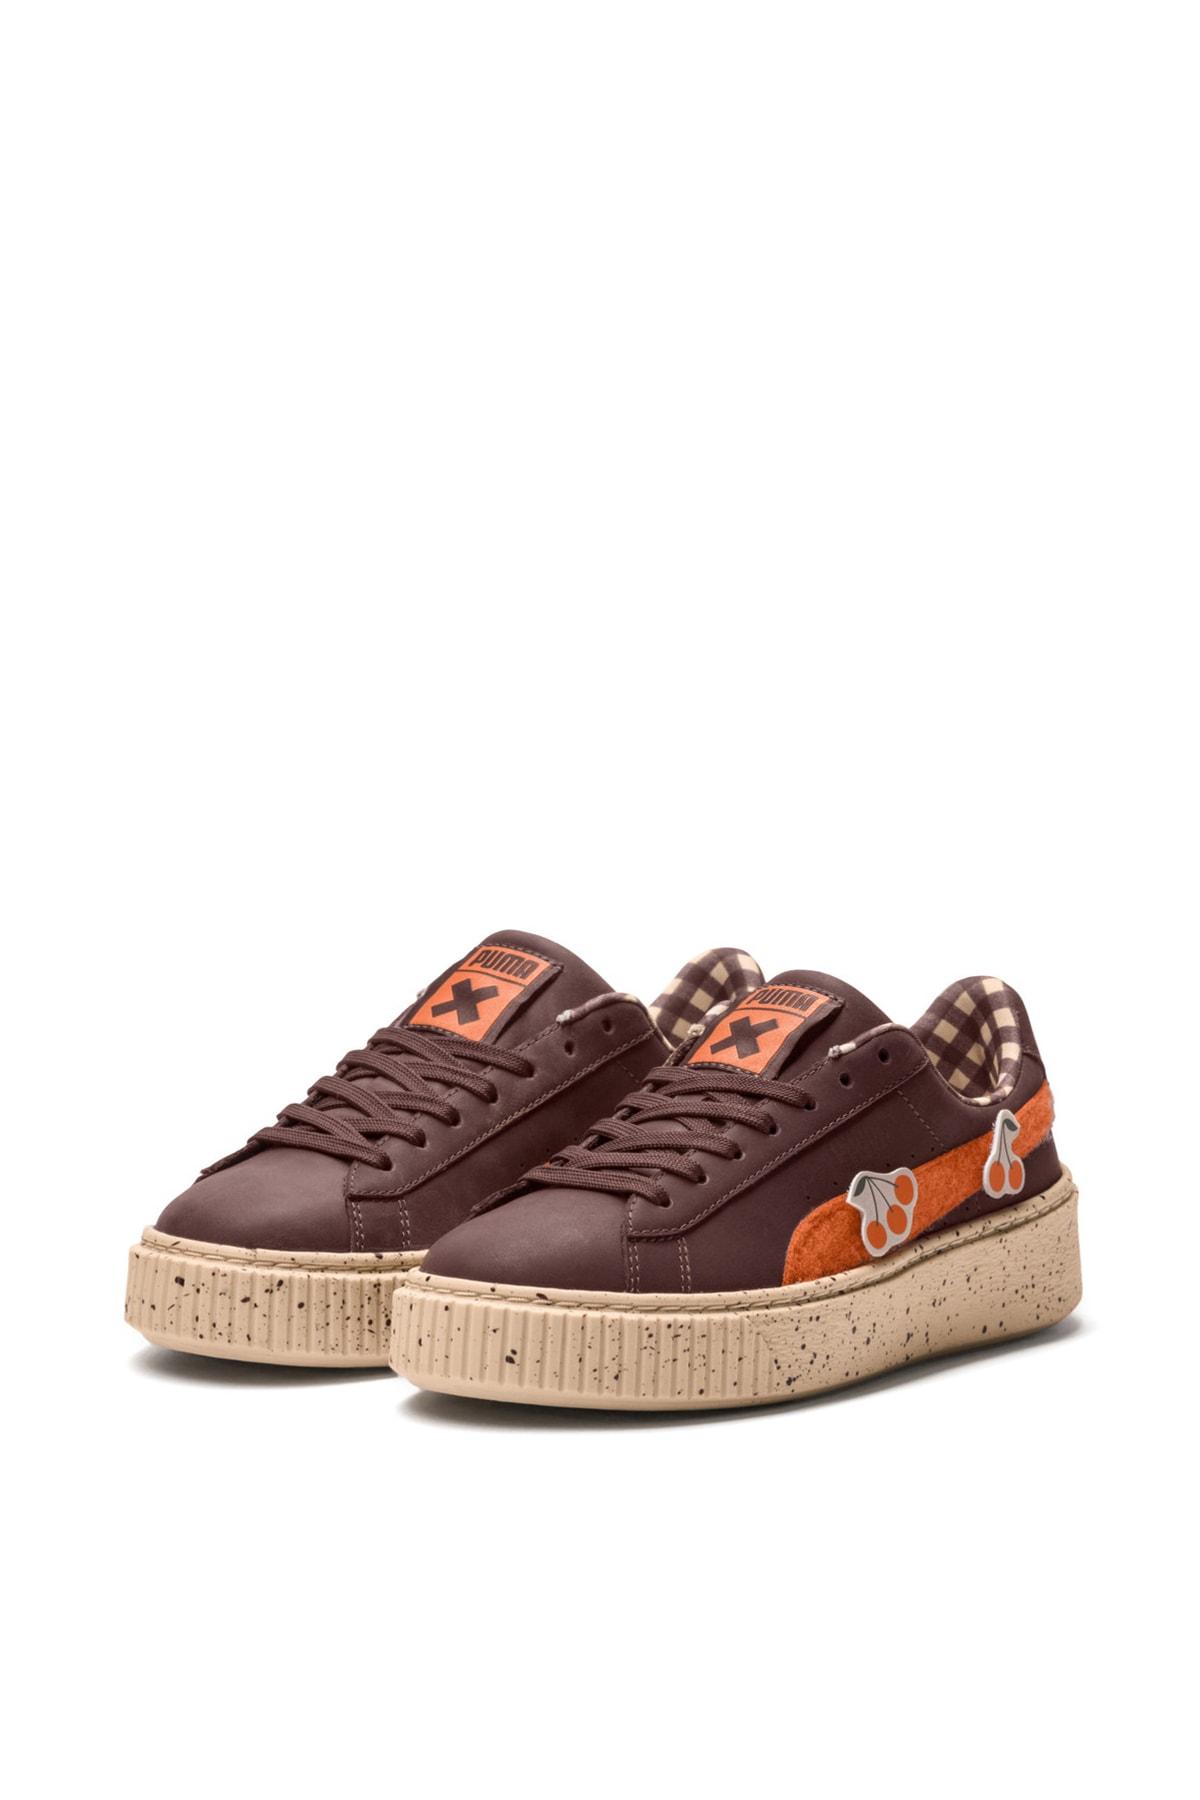 Puma PUMA x TINYCOTTONS Basket Platform Çocuk Ayakkabı 1